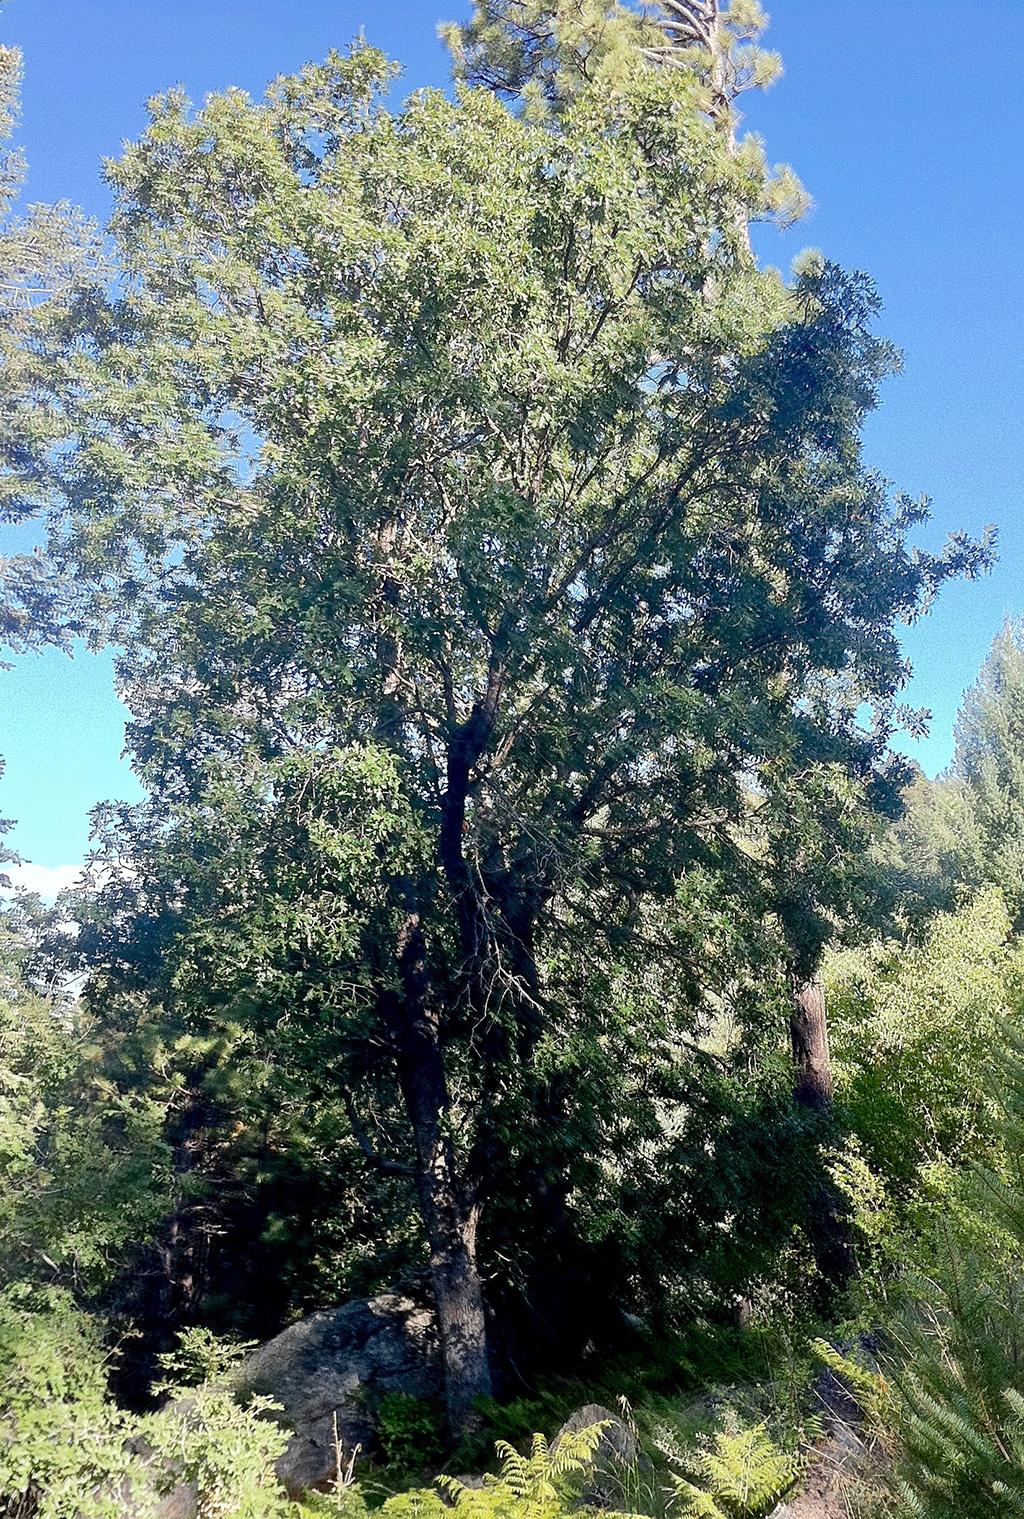 Mount Lemmon White Oak